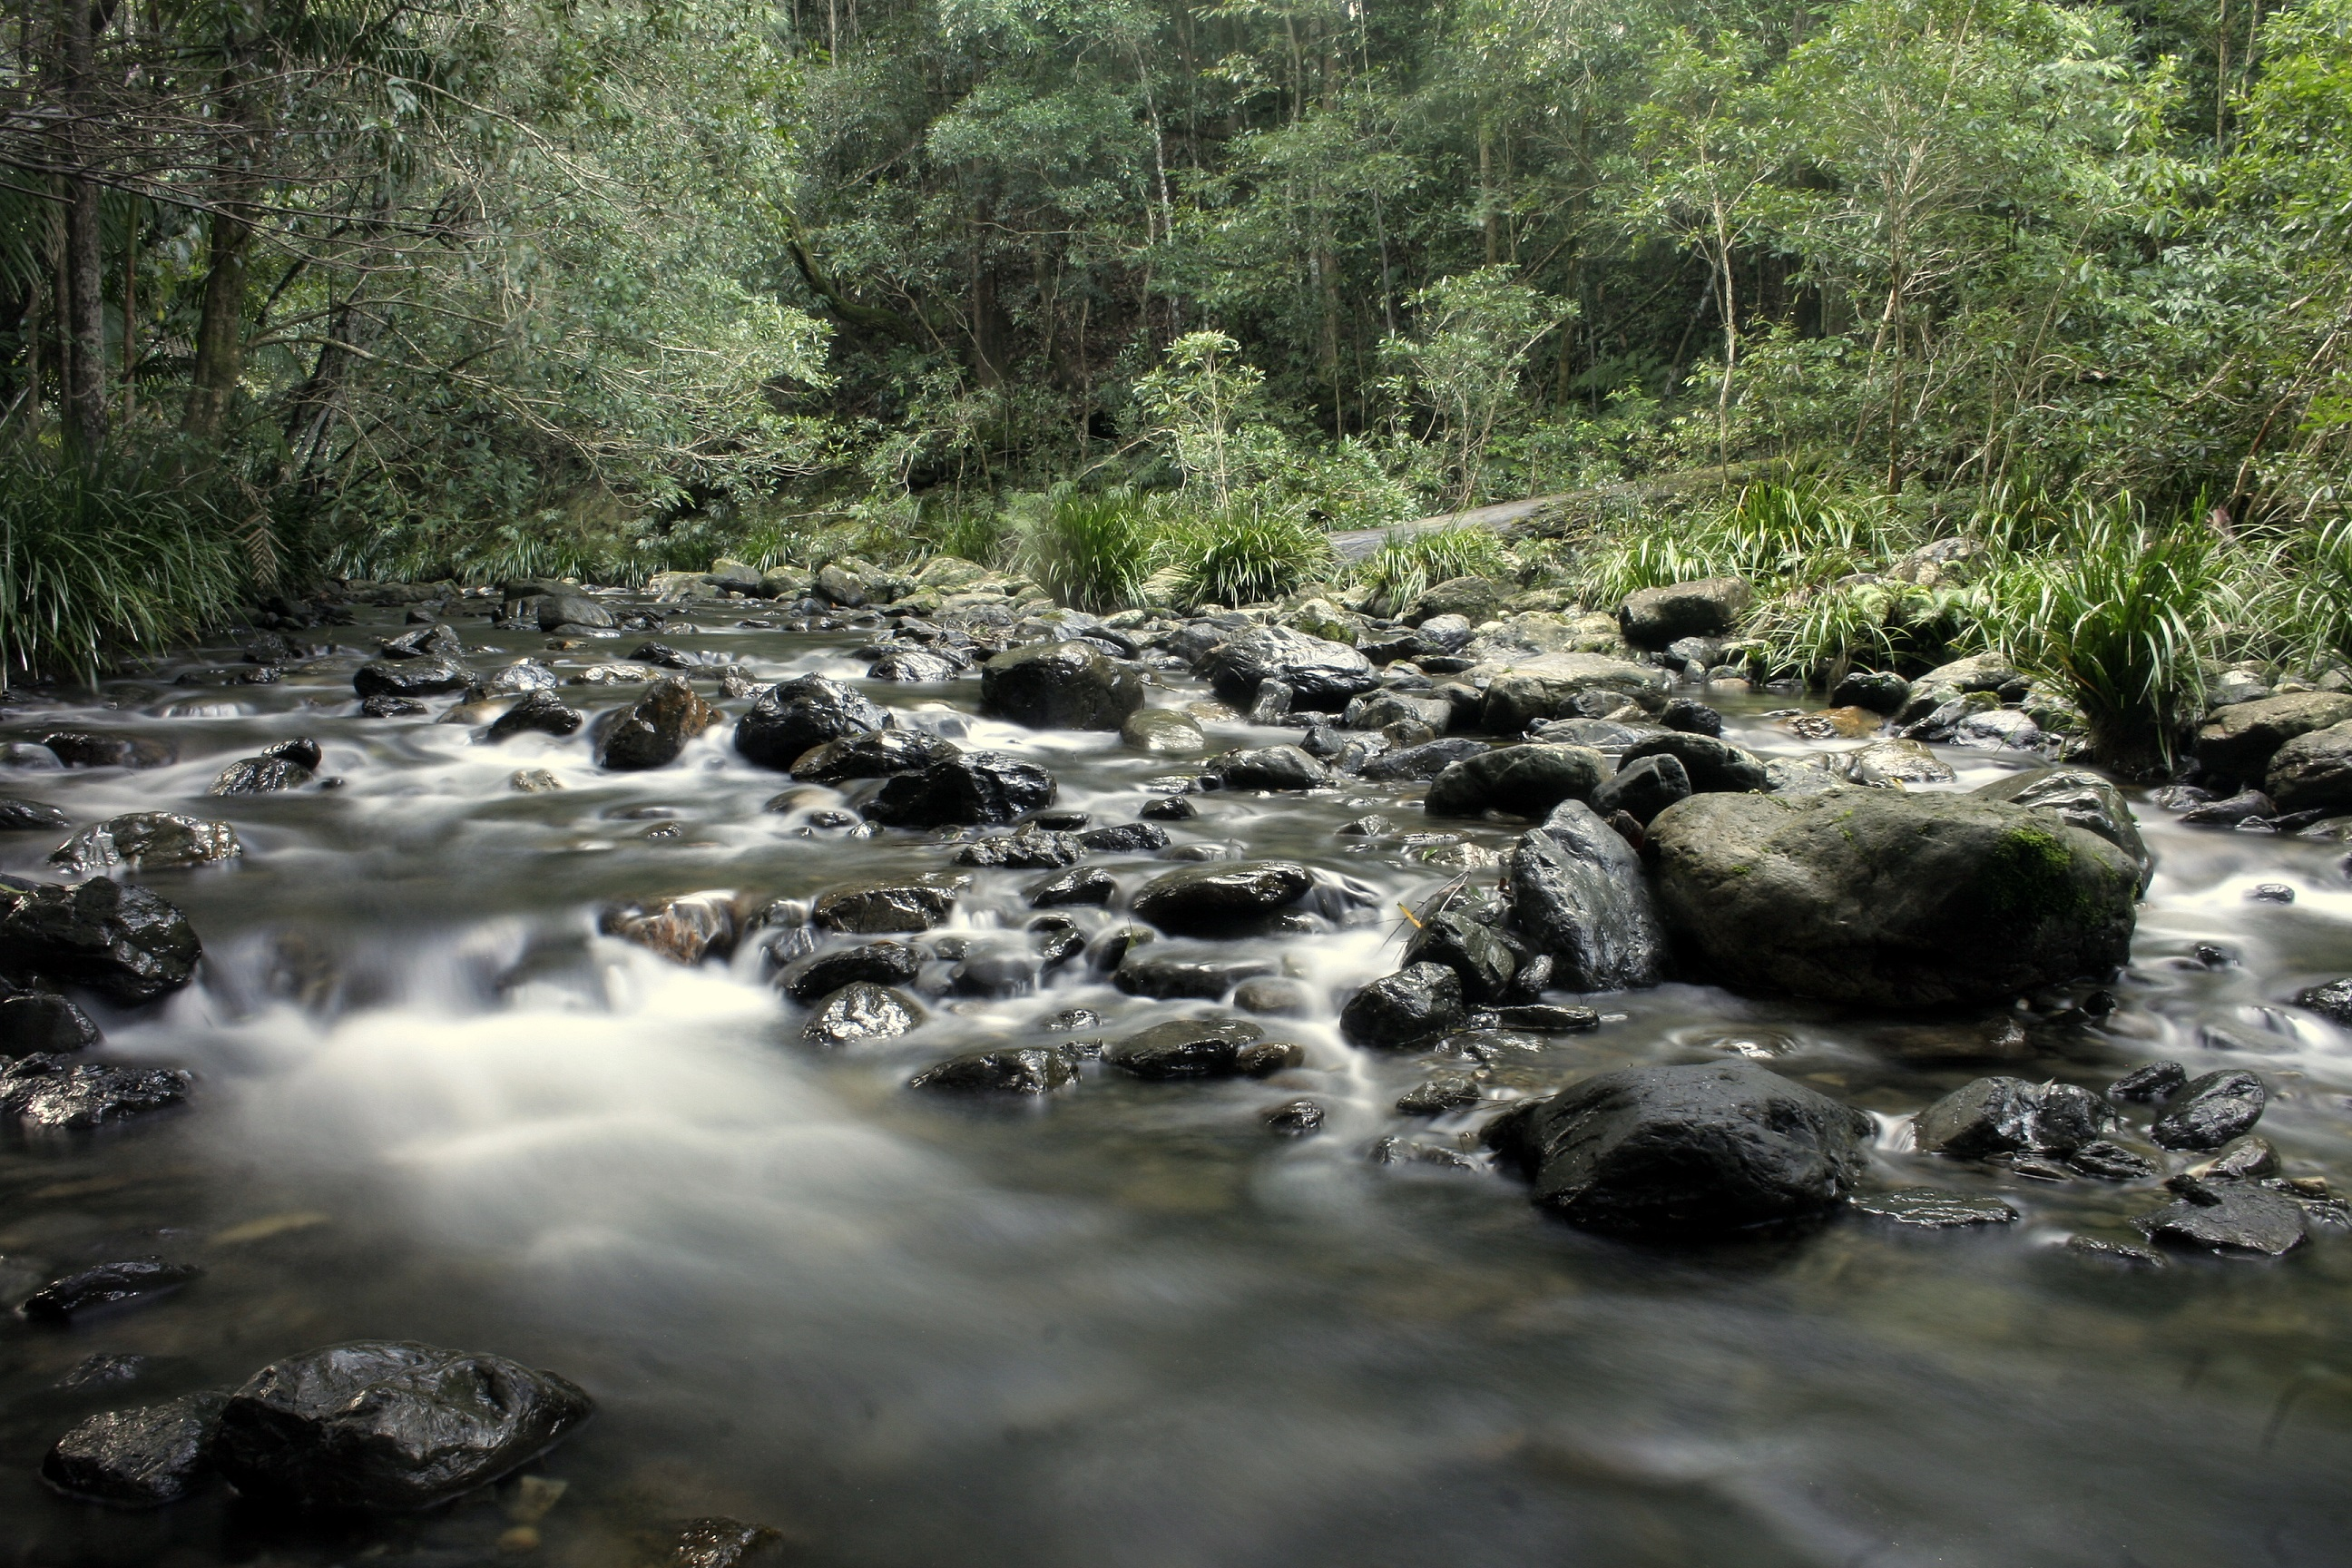 Calm waters of Bindarri National Park